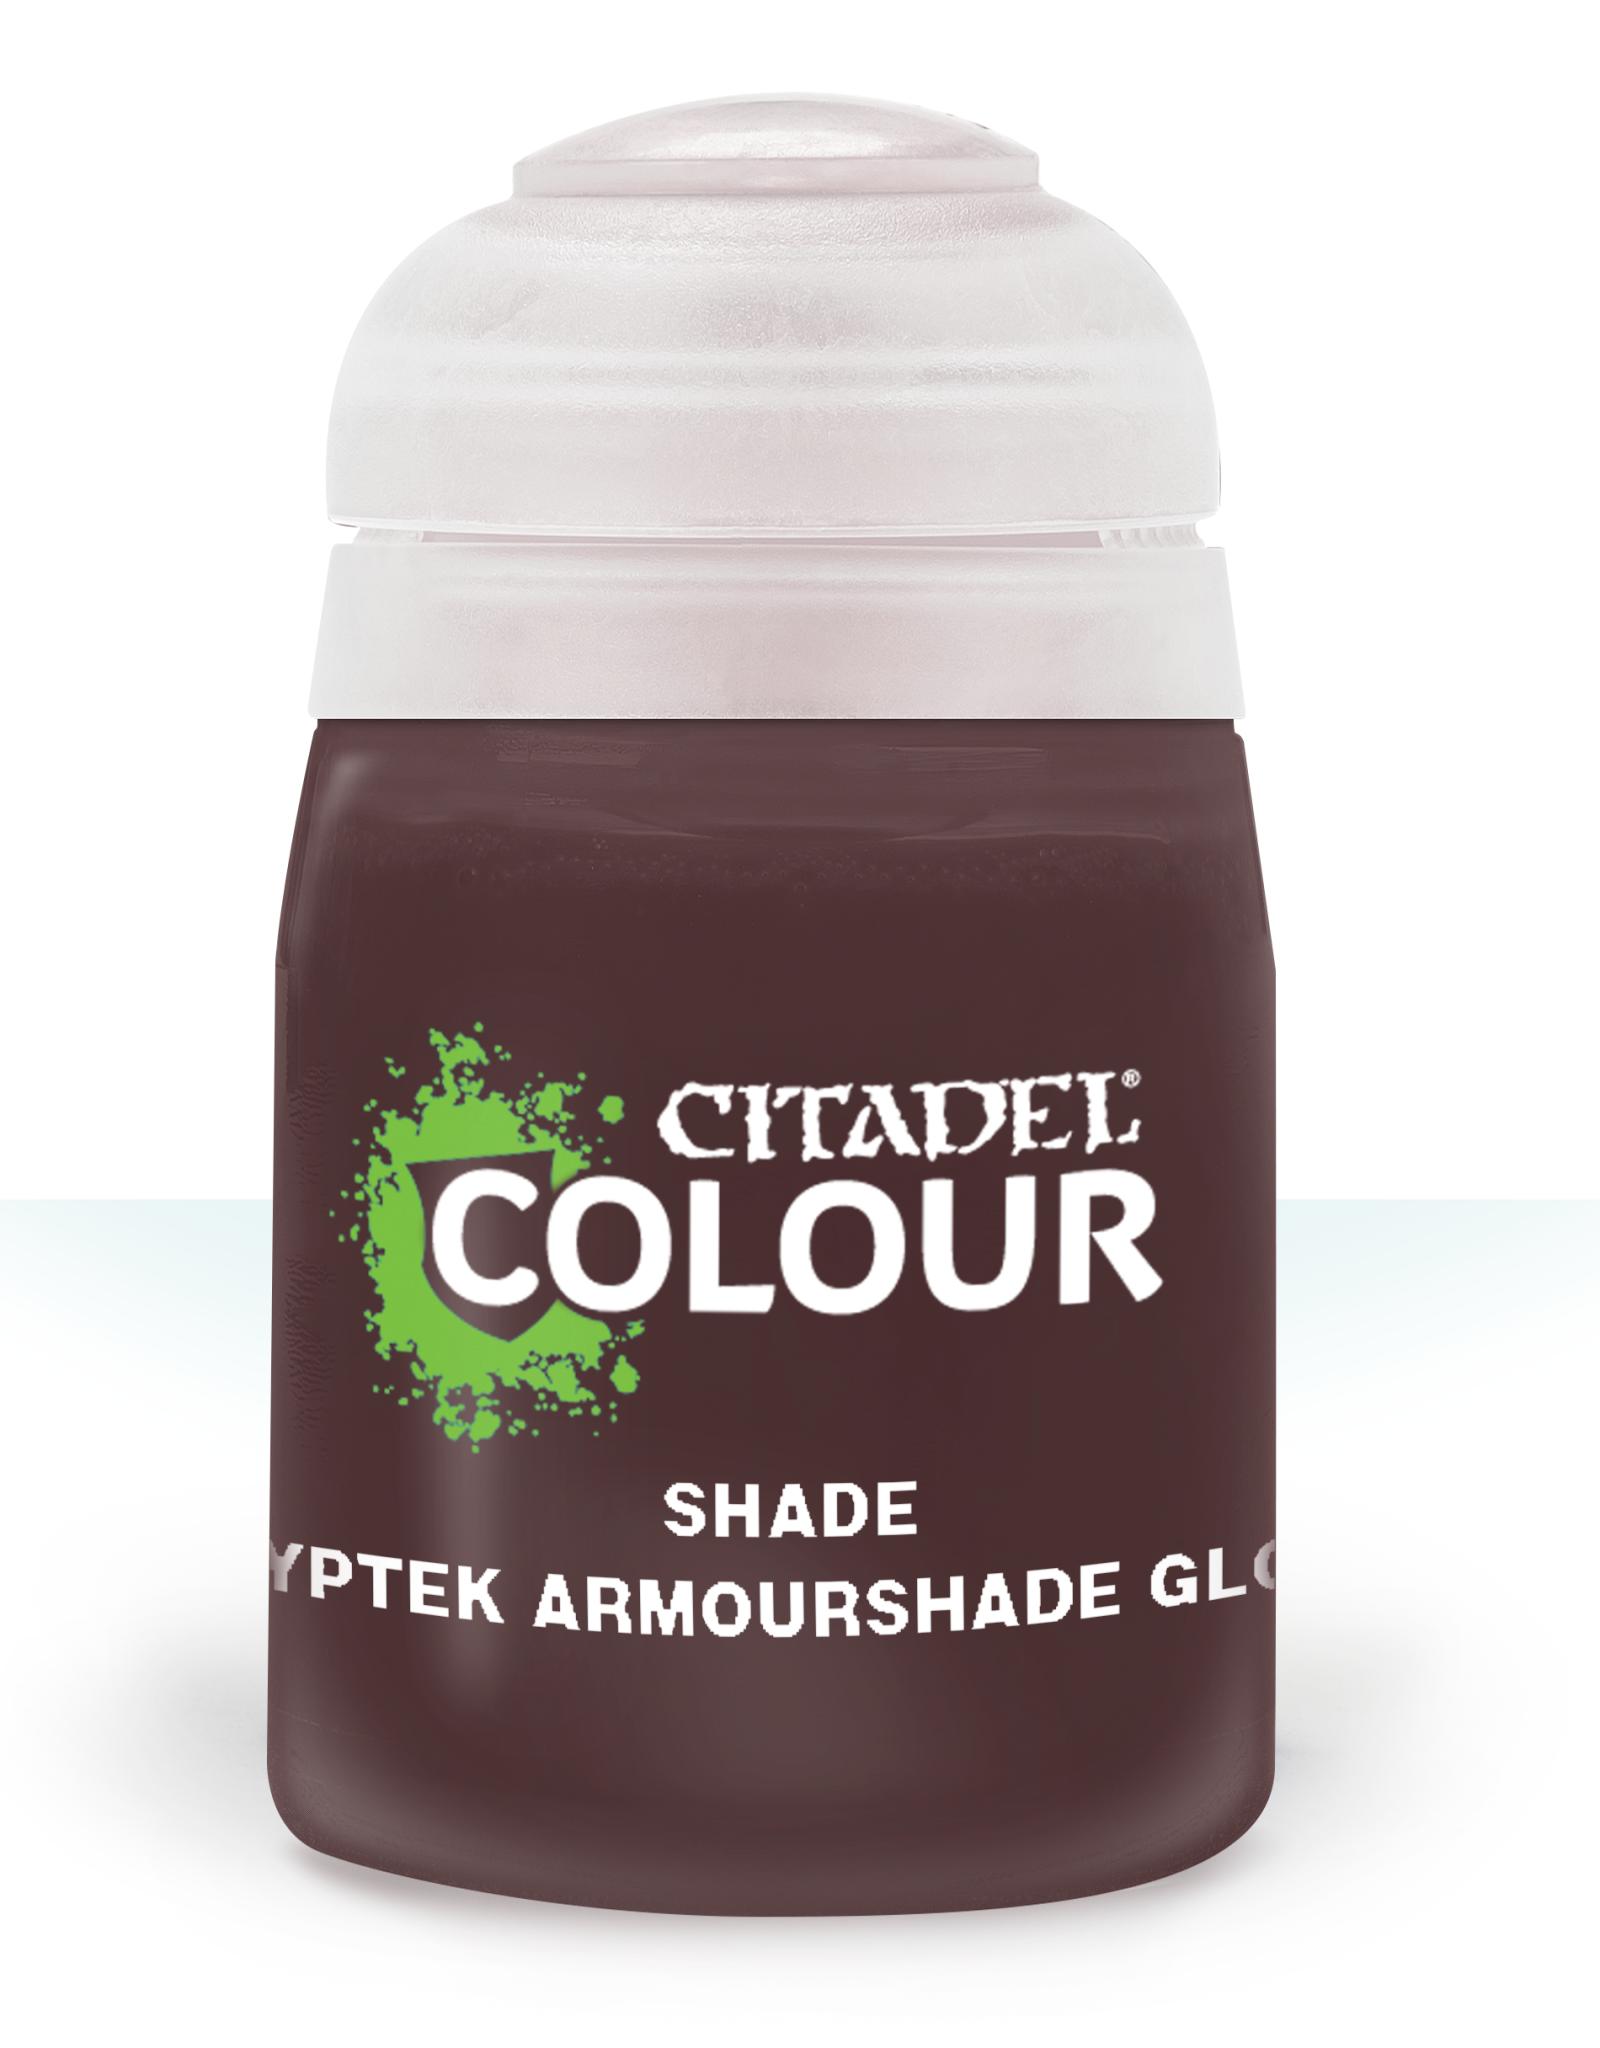 Games Workshop Citadel:  Shade: CRYPTEK ARMOURSHADE